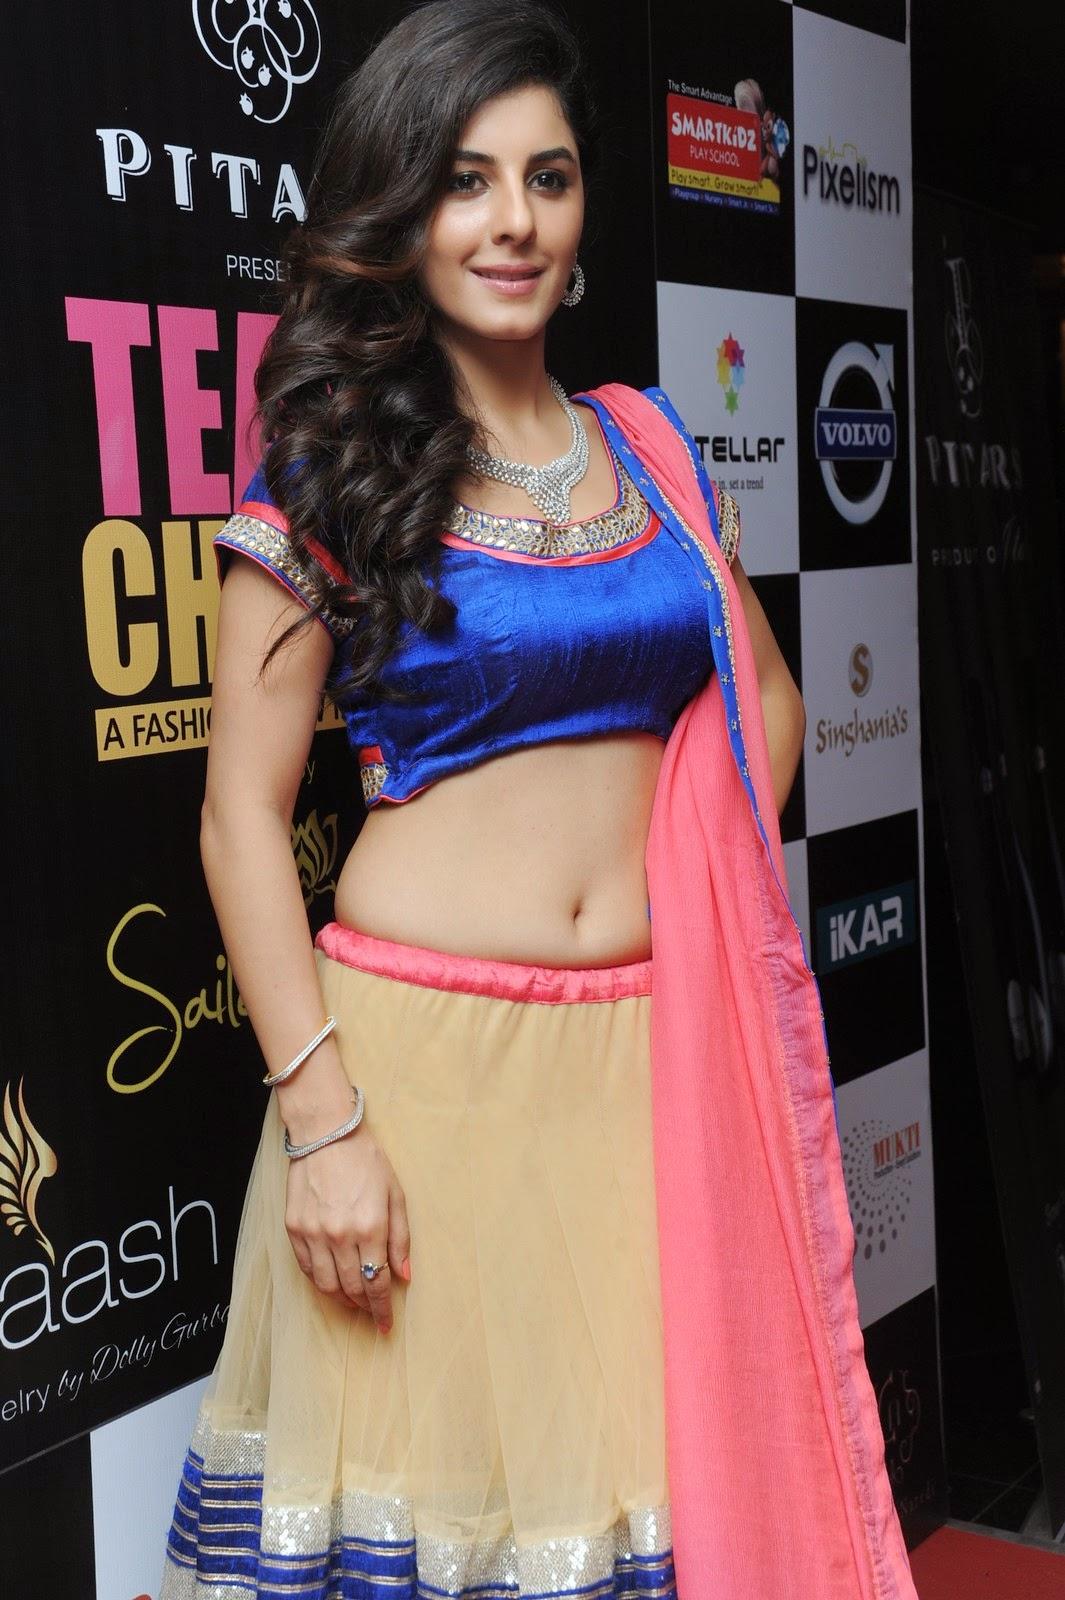 Isha talwar latest glam pics-HQ-Photo-11